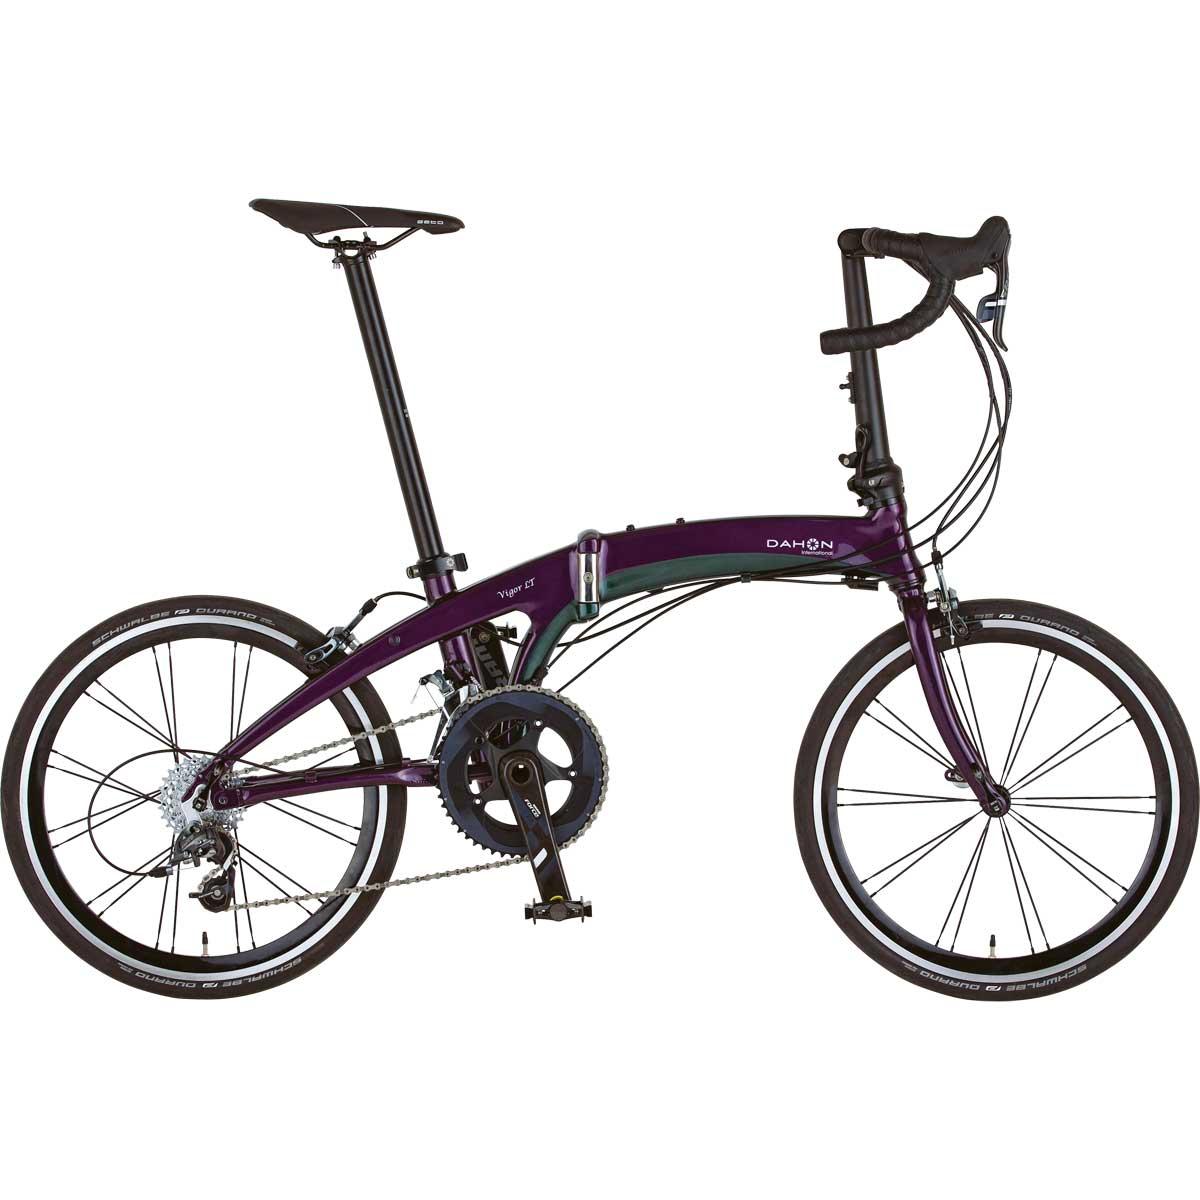 DAHON/ダホン Vigor LT ヴィガー LT オーロラ(9021) 折りたたみ自転車 自転車本体